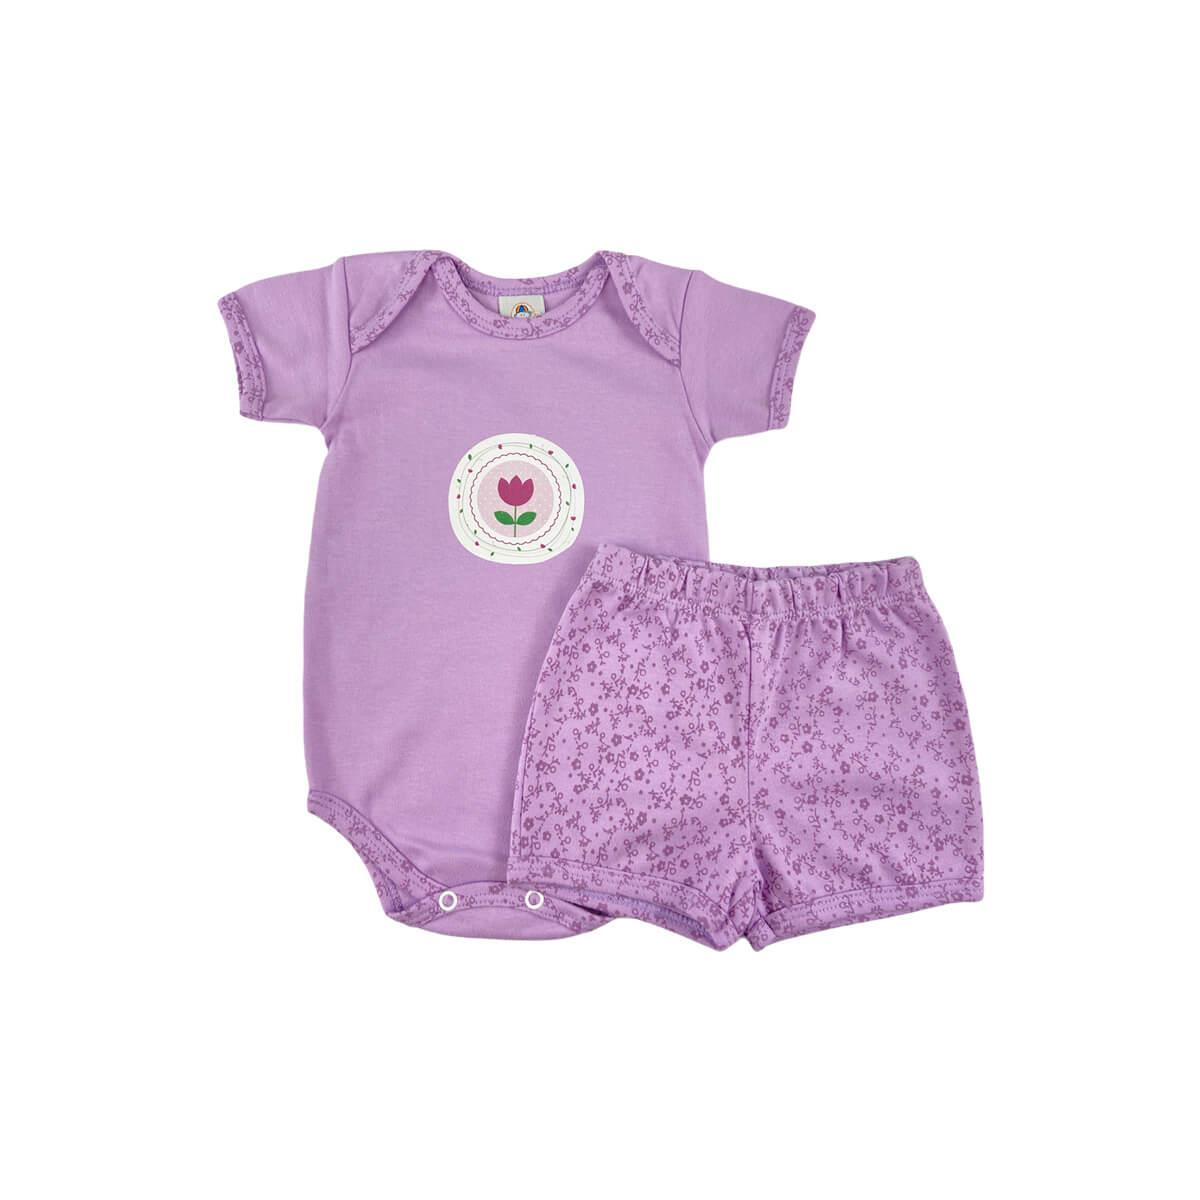 Conjunto Bebê Curto Floral Lilás  - Piu Blu